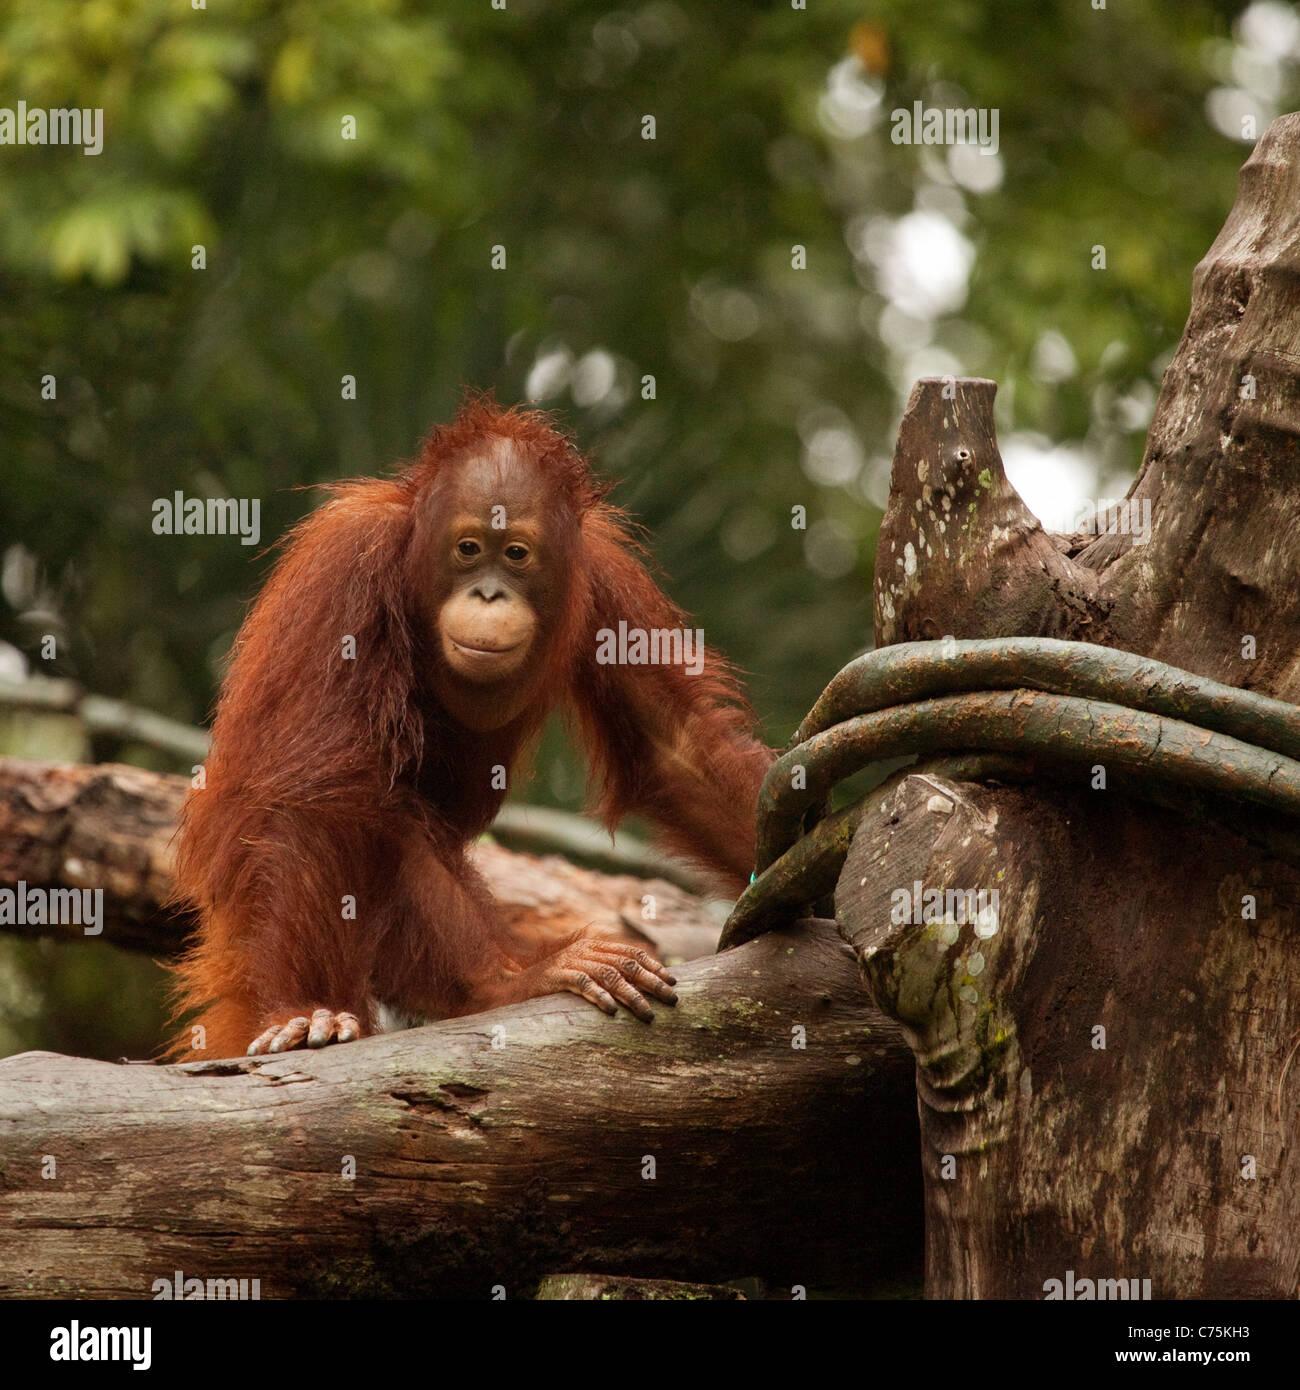 Bornean Orangutan (Pongo pygmaeus) presso lo zoo di Singapore, Singapore asia Immagini Stock